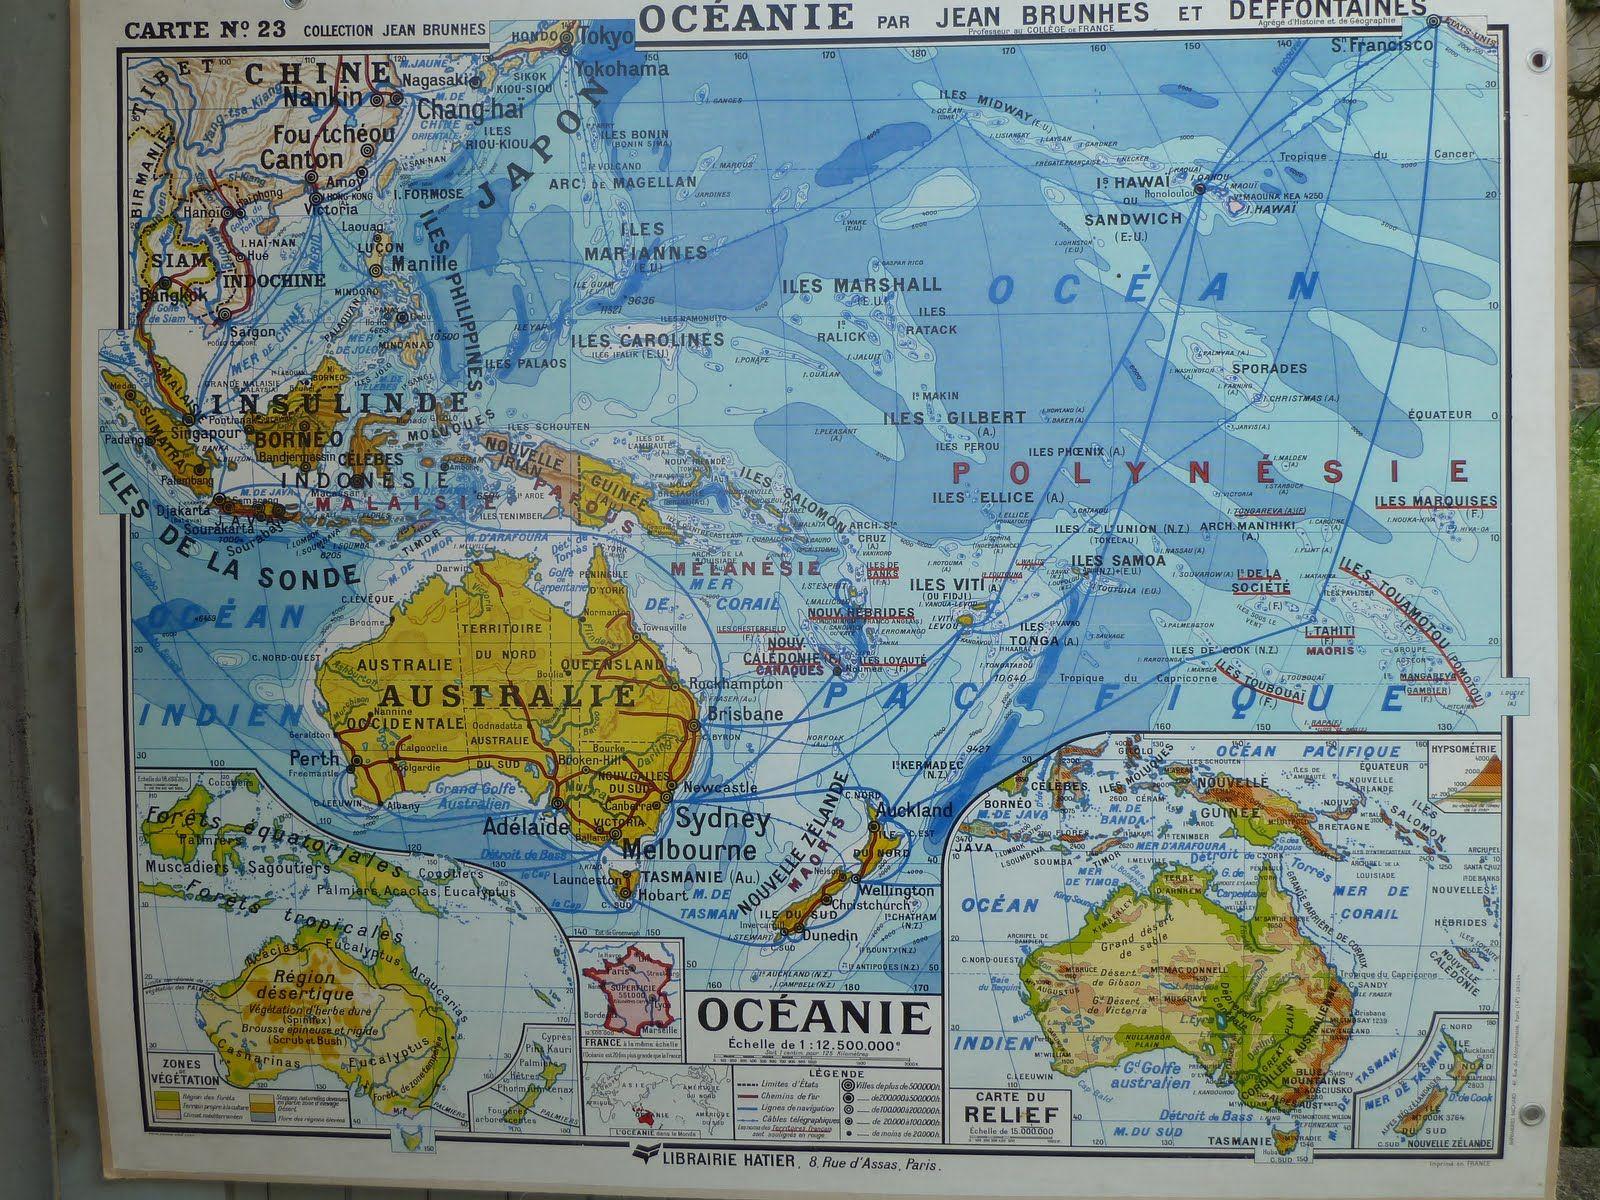 Old world maps australia old lets explorer all world maps old world maps australia old lets explorer all world maps gumiabroncs Gallery